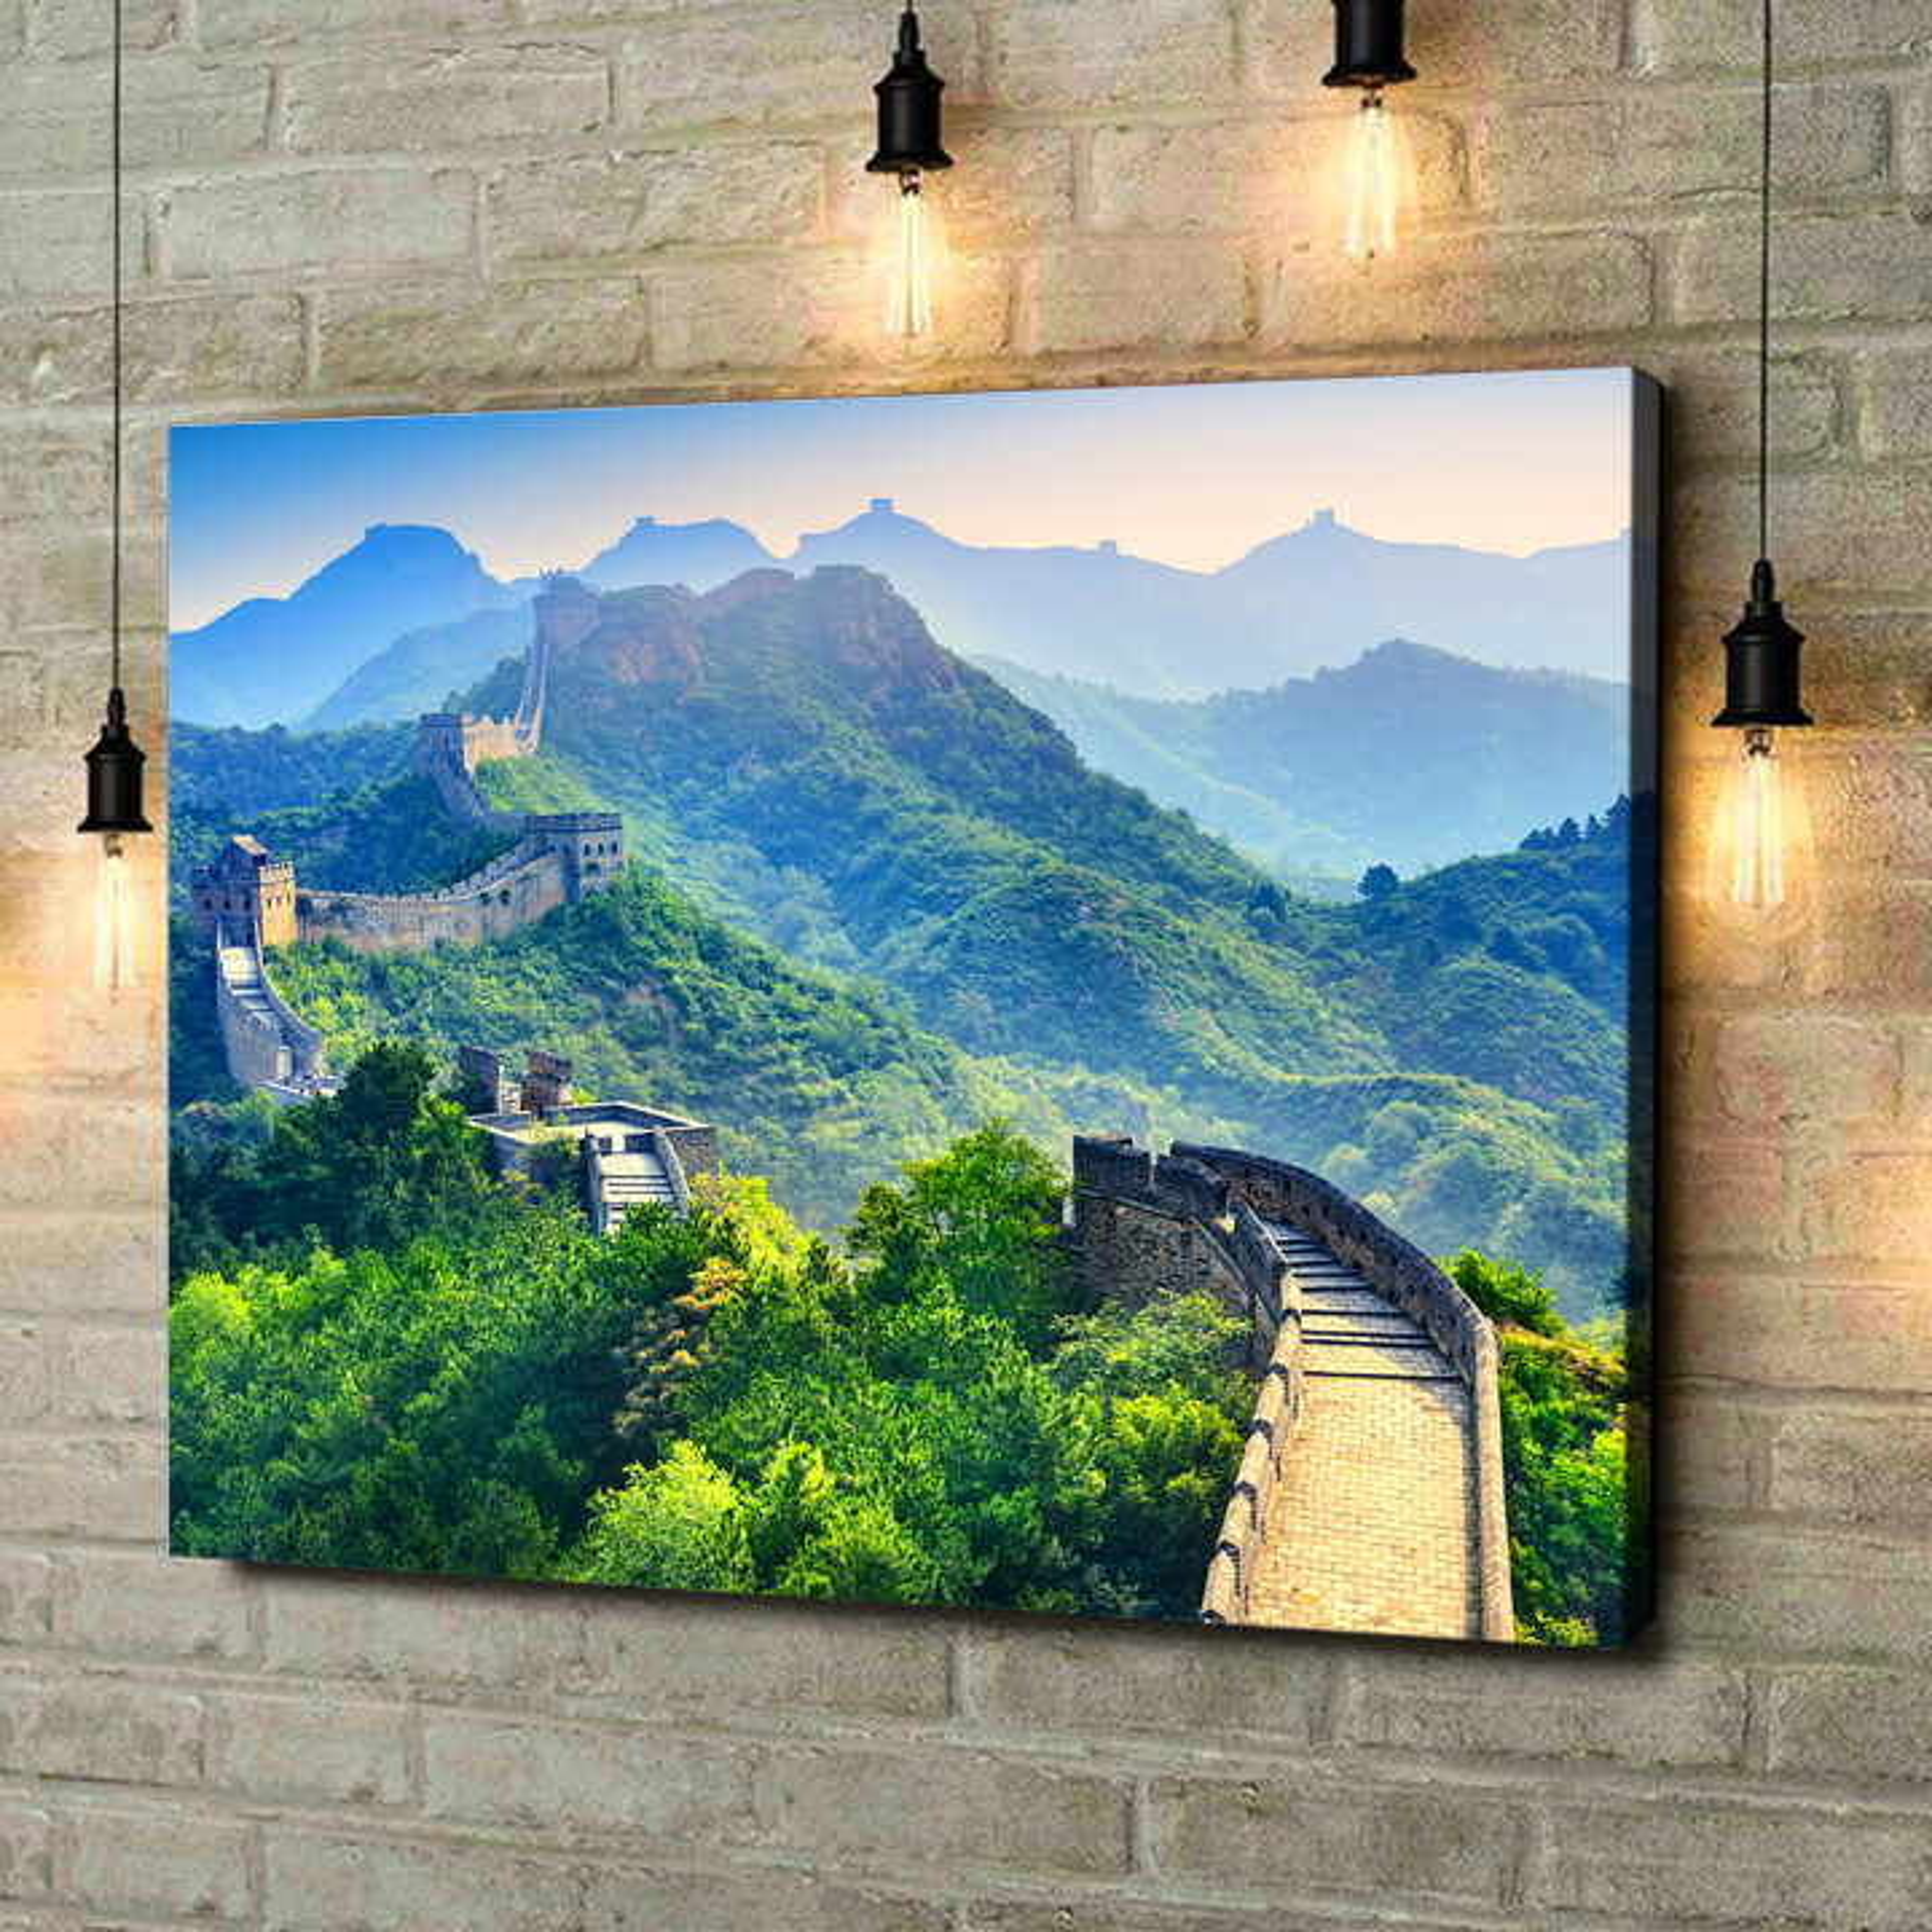 Leinwandbild personalisiert Chinesische Mauer